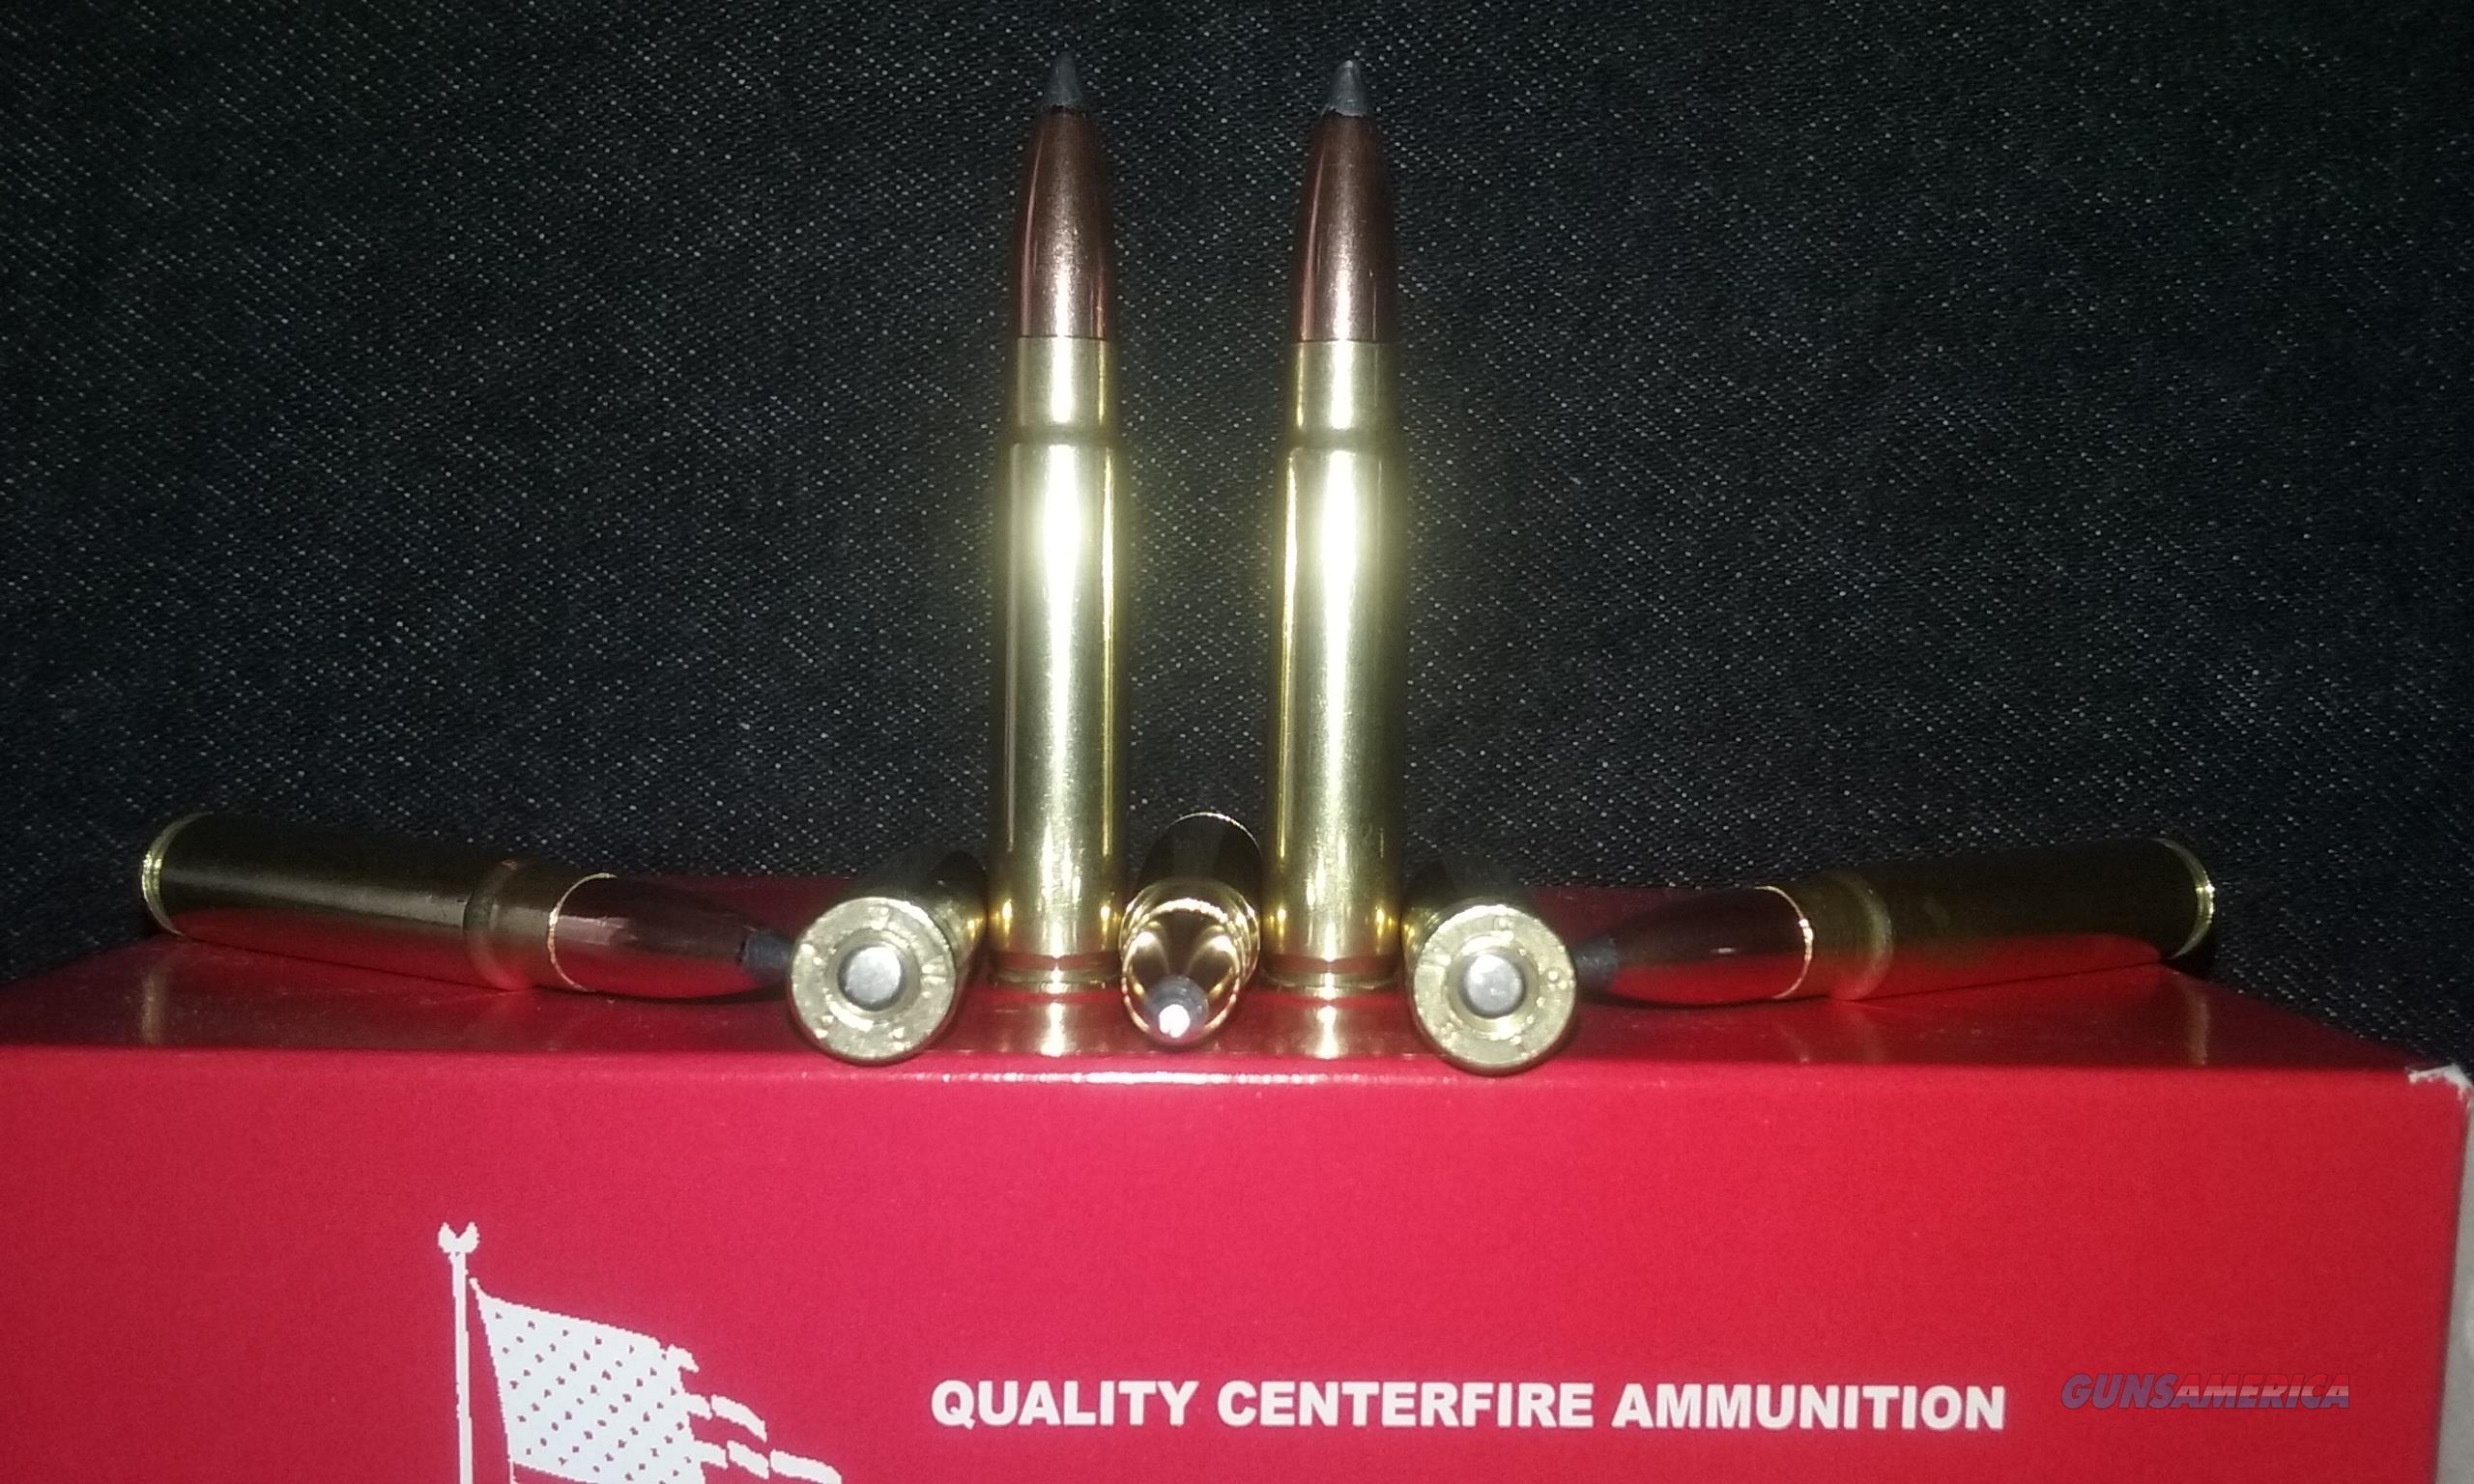 7mm TC/U Ammo. (7mm Thompson Center / Ugalde)  Non-Guns > Ammunition